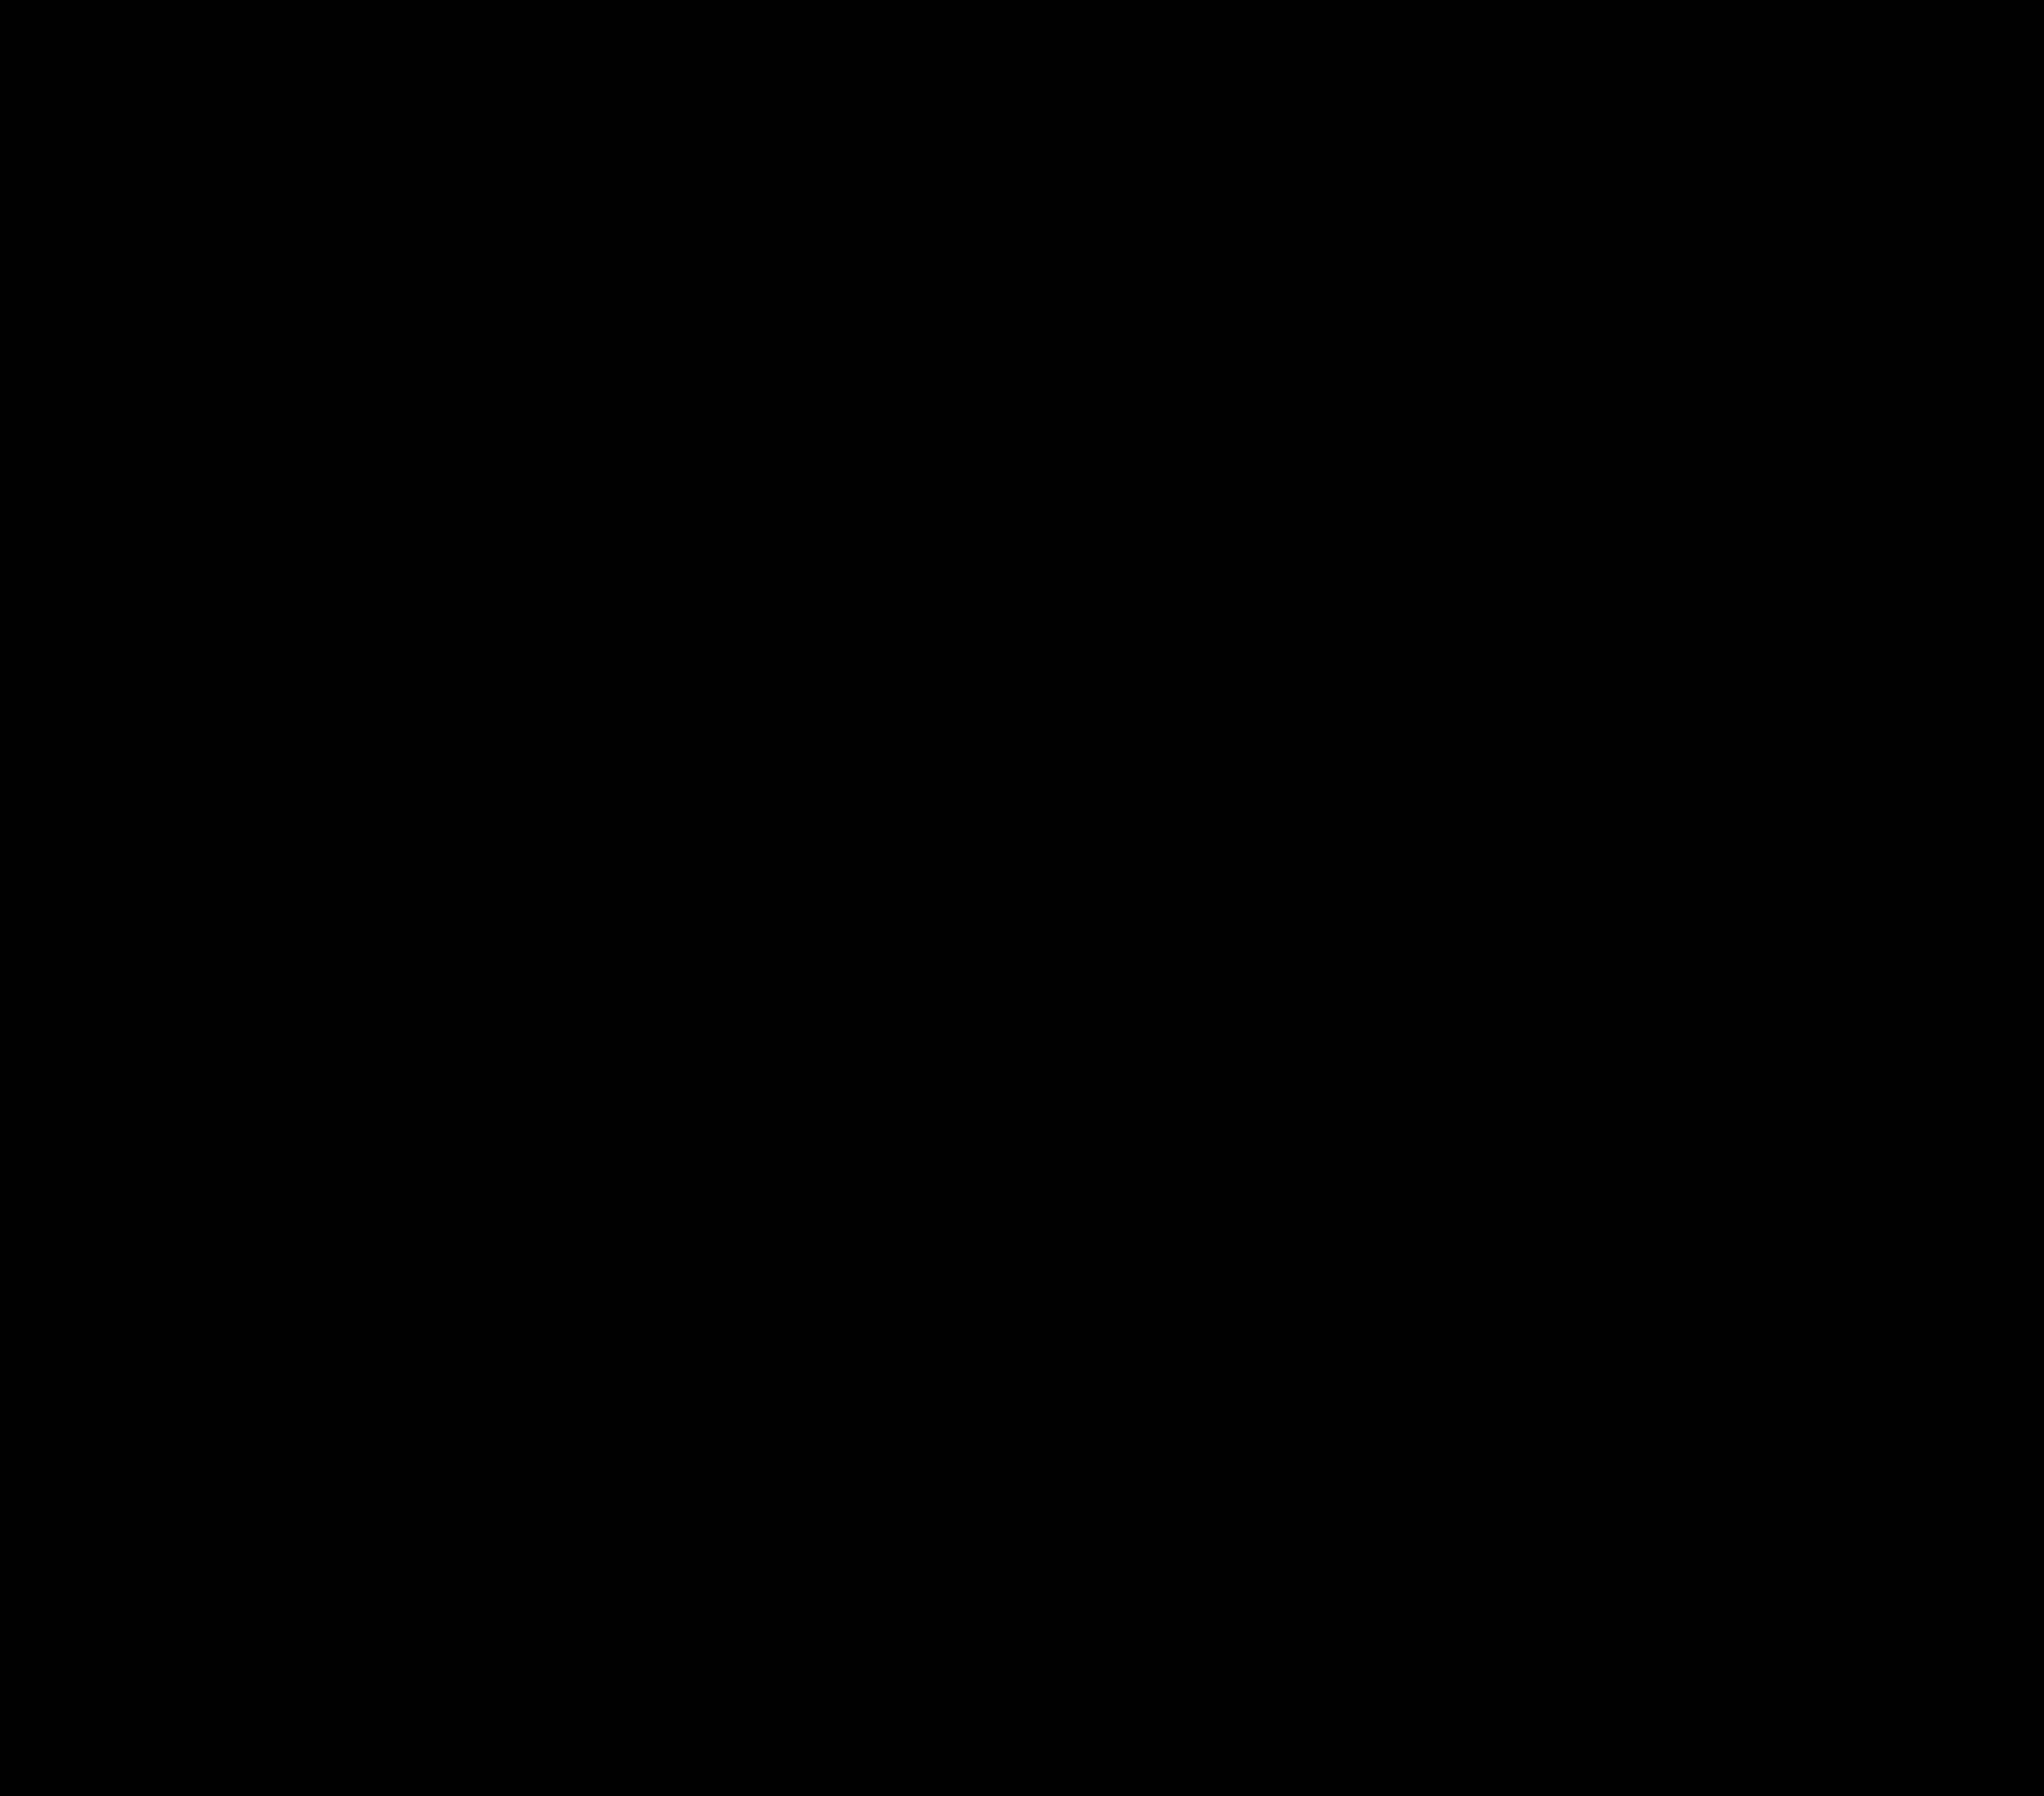 (2048 x 1800)